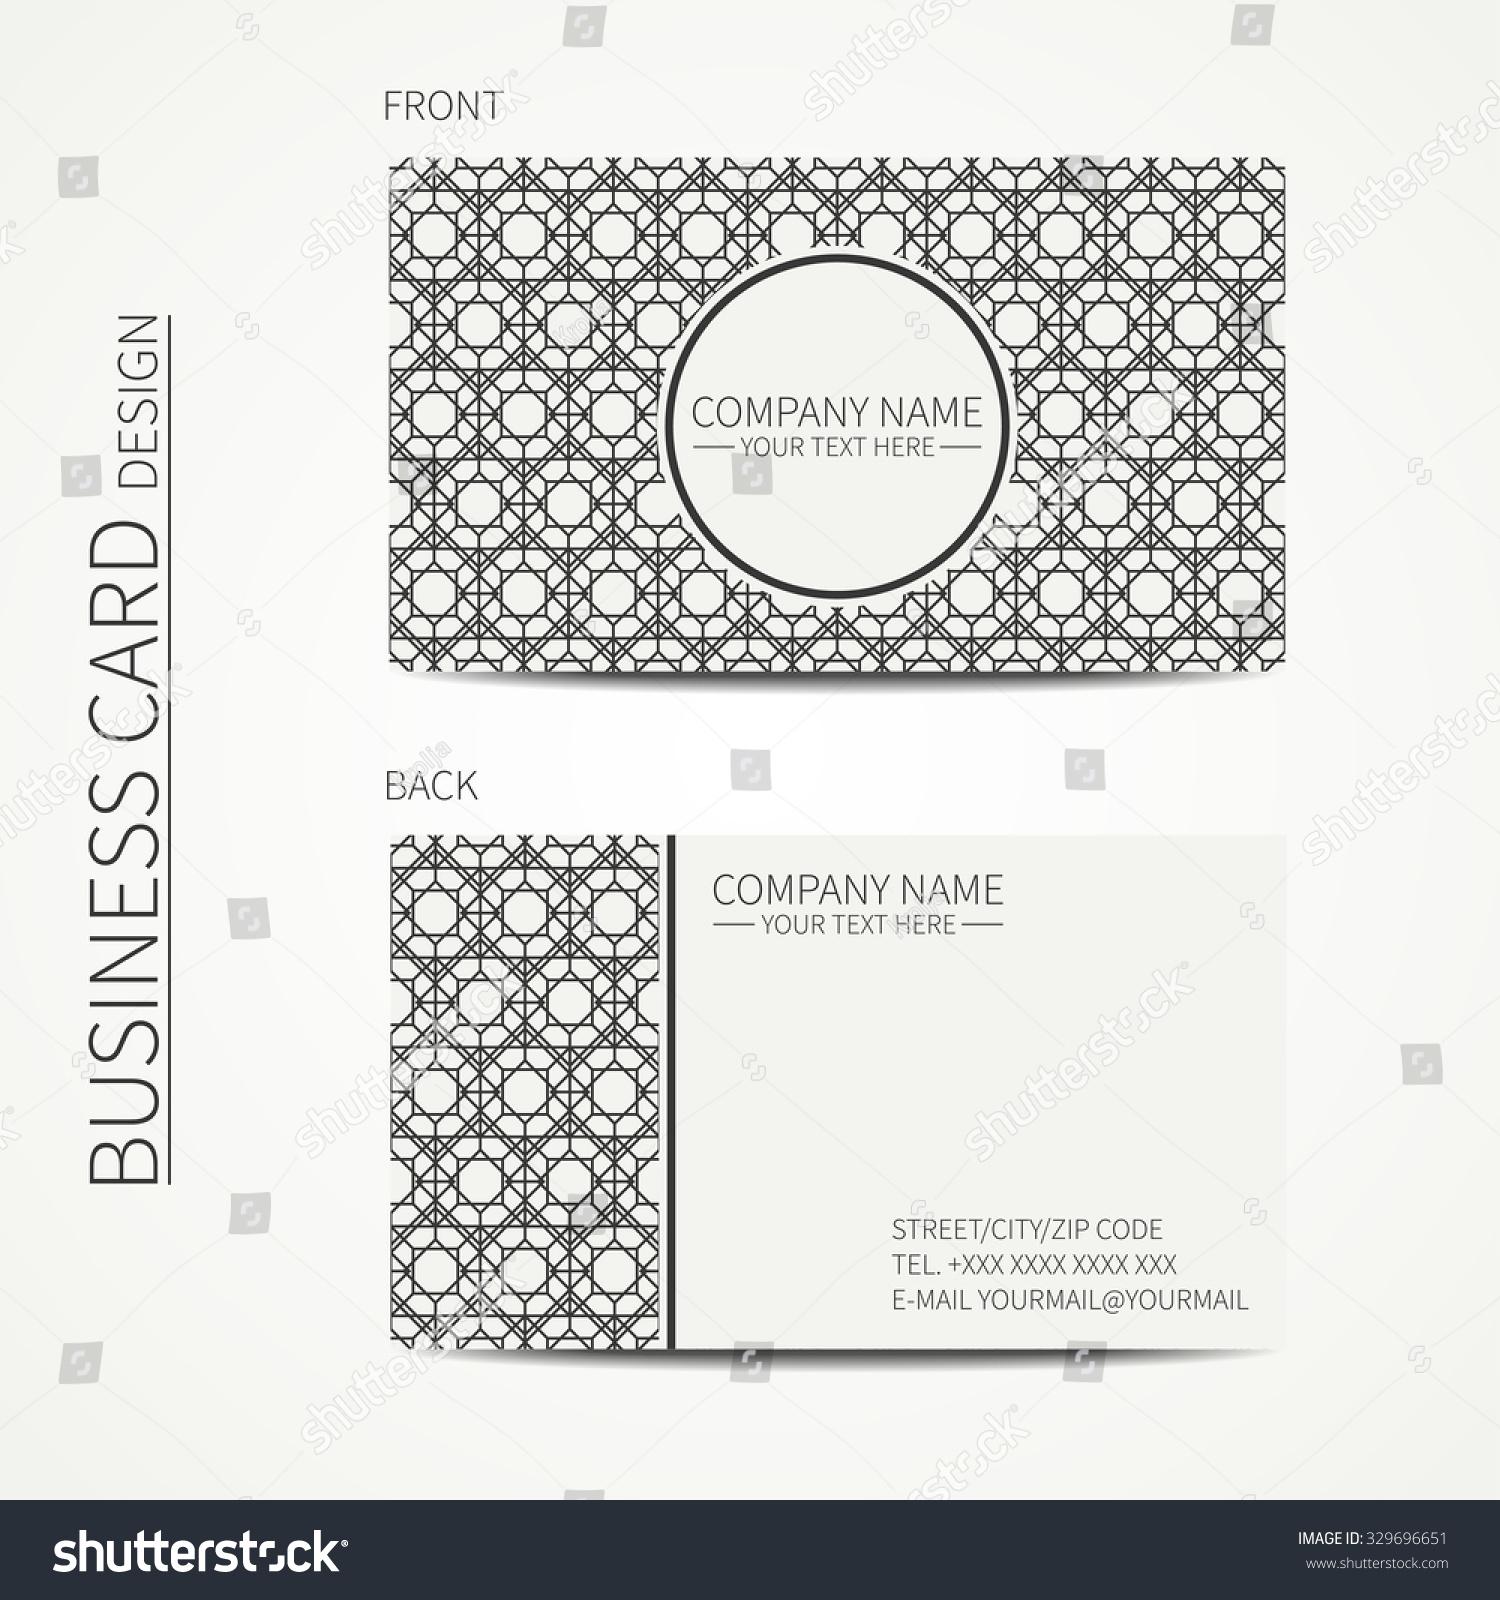 Geometric Lattice Monochrome Business Card Template Stock Vector